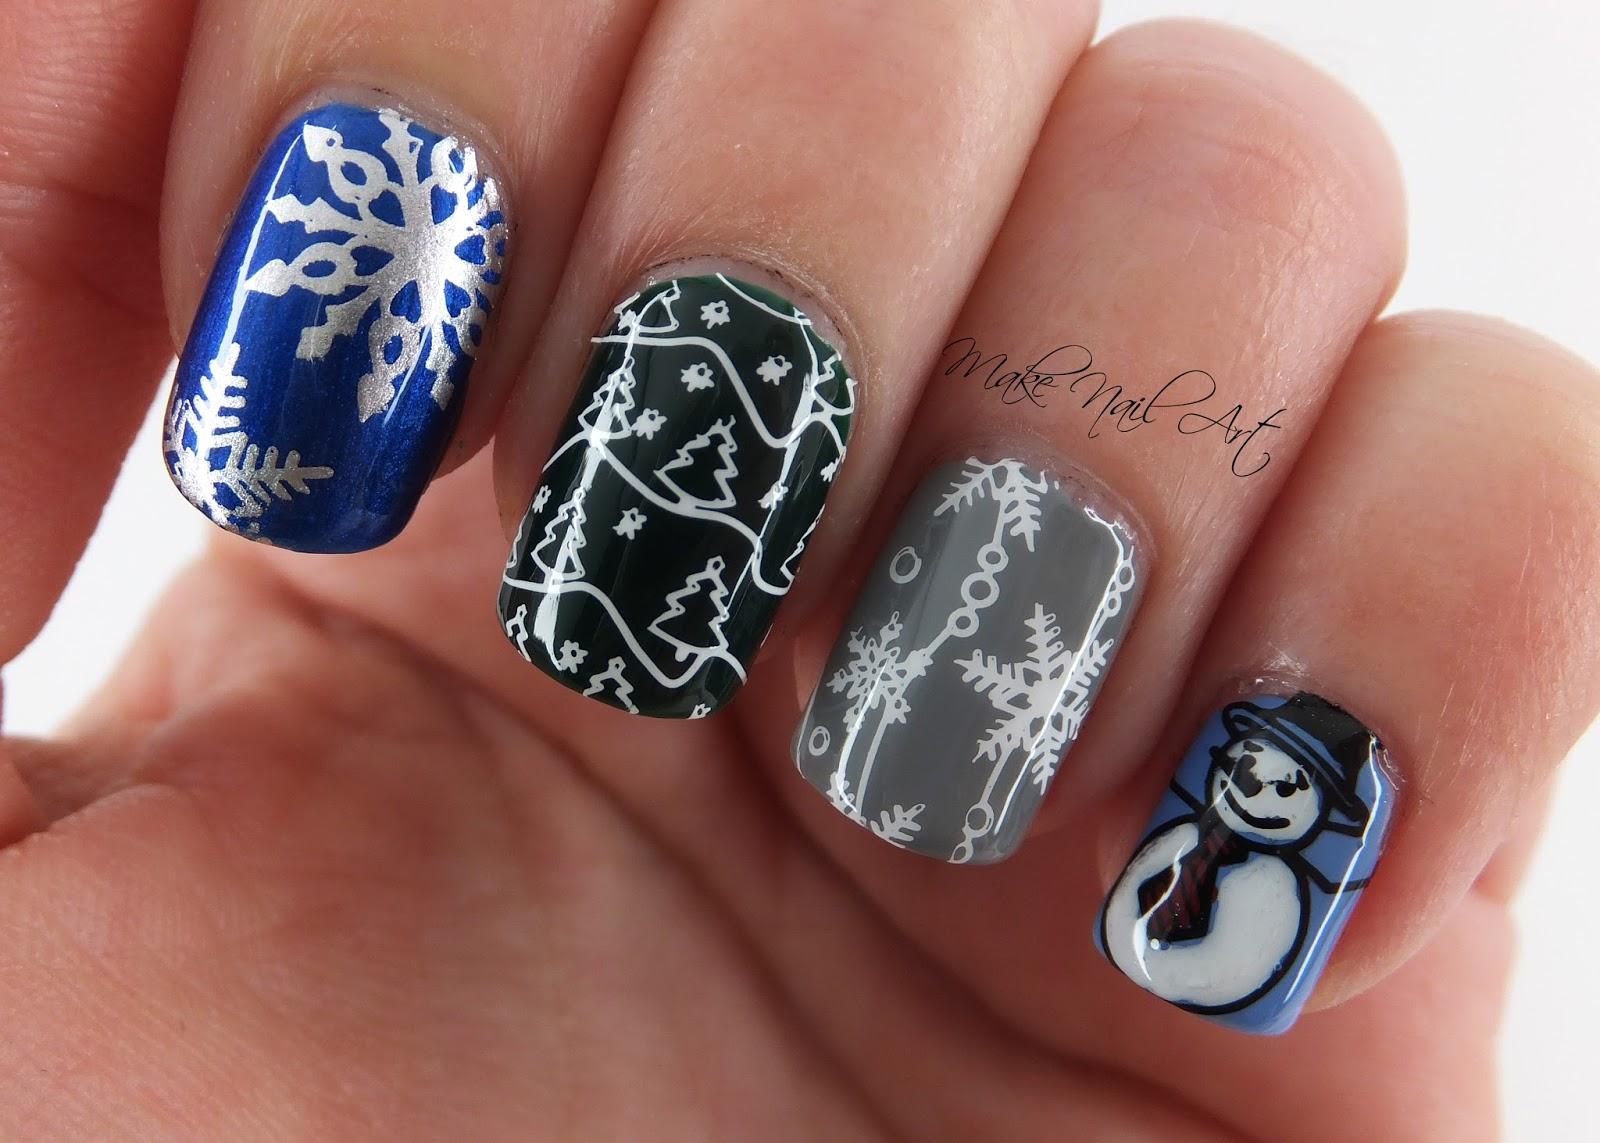 Make Nail Art Winter Vibes Stamping Nail Art Design Tutorial